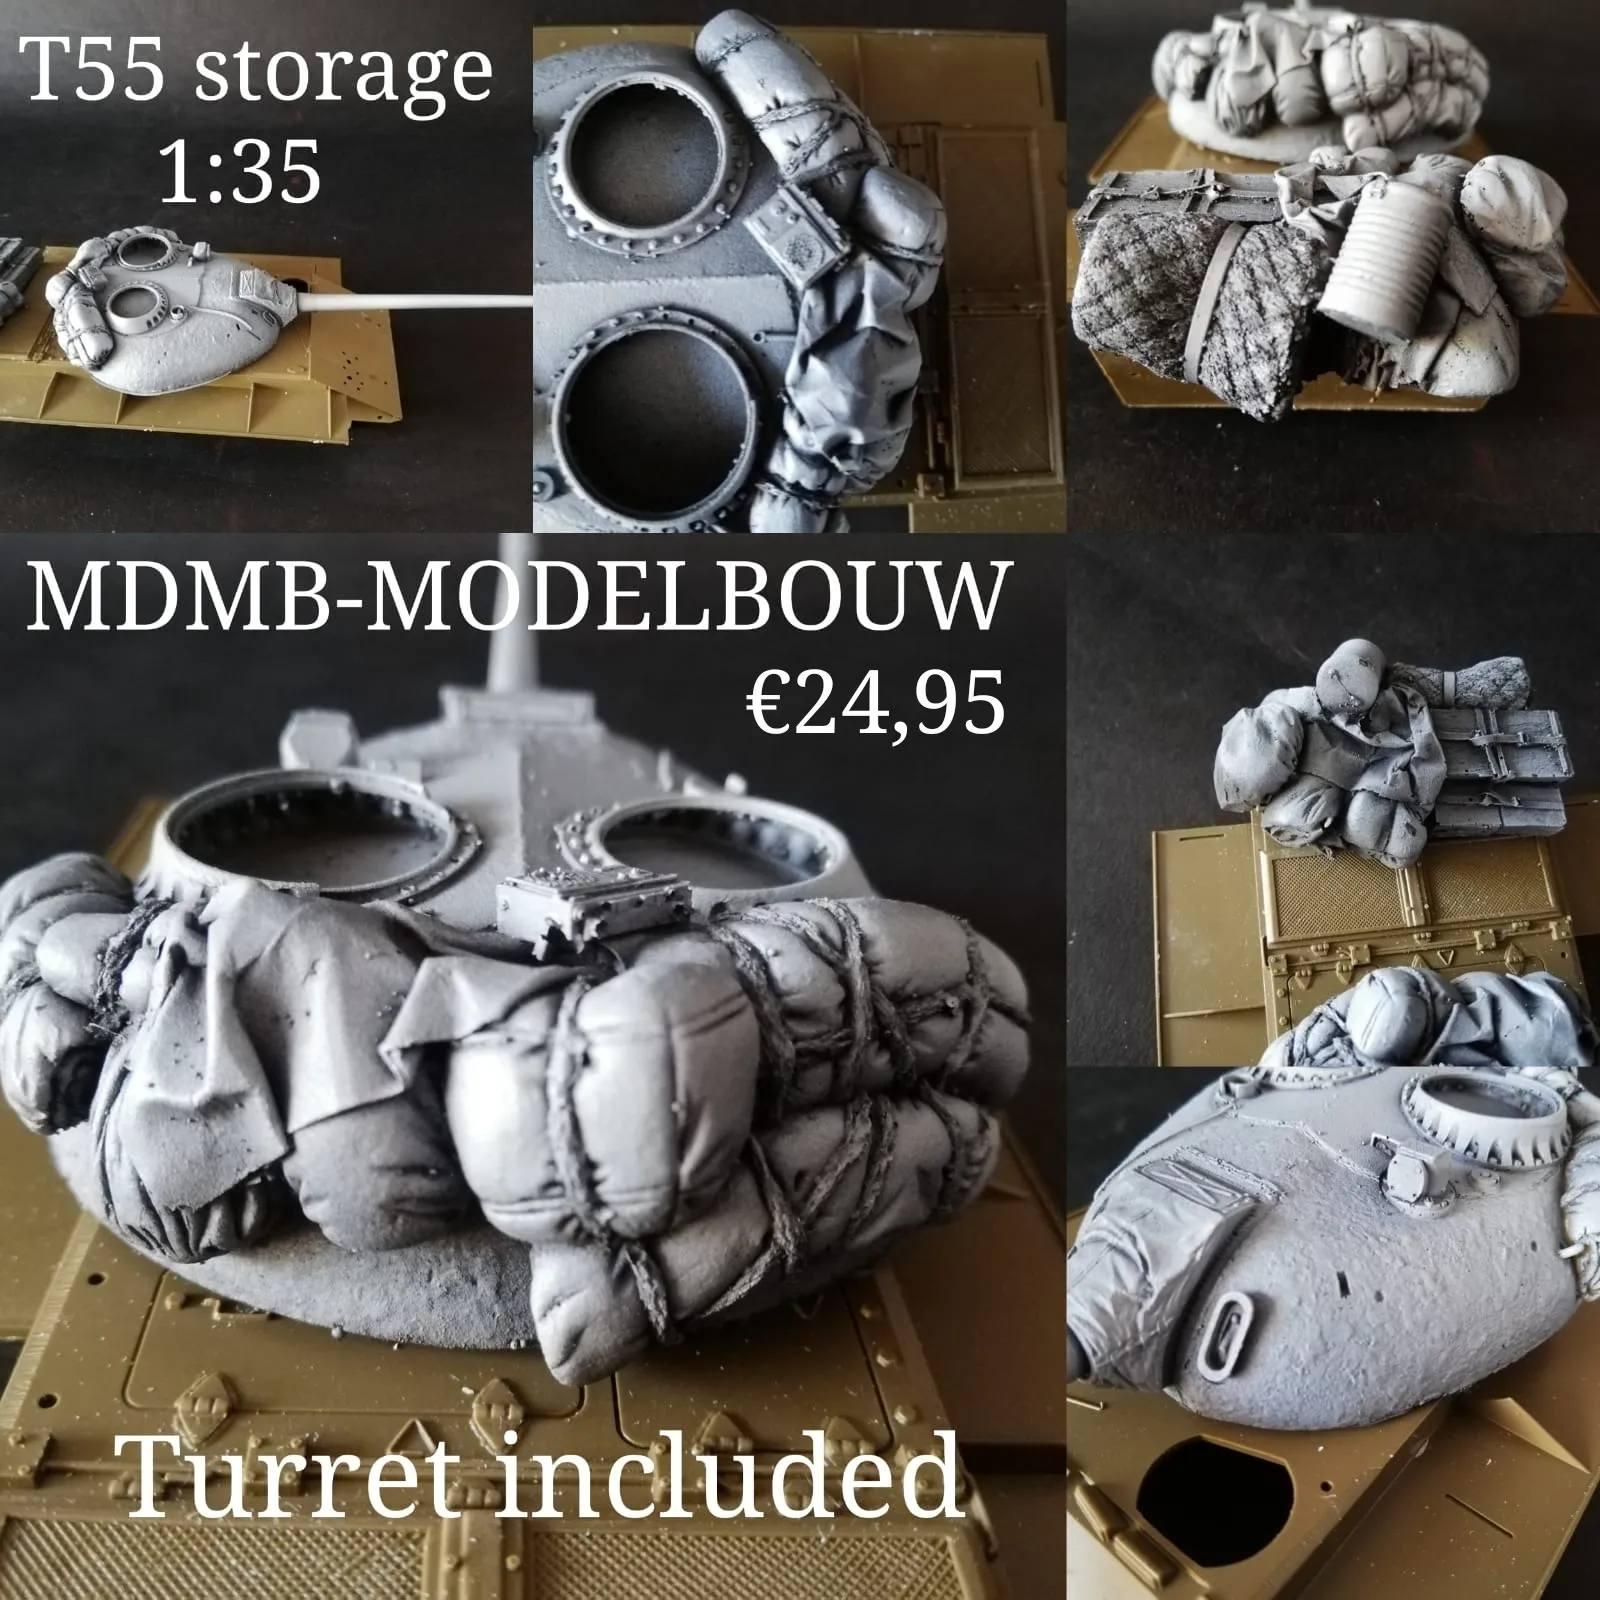 T55 Storage Image